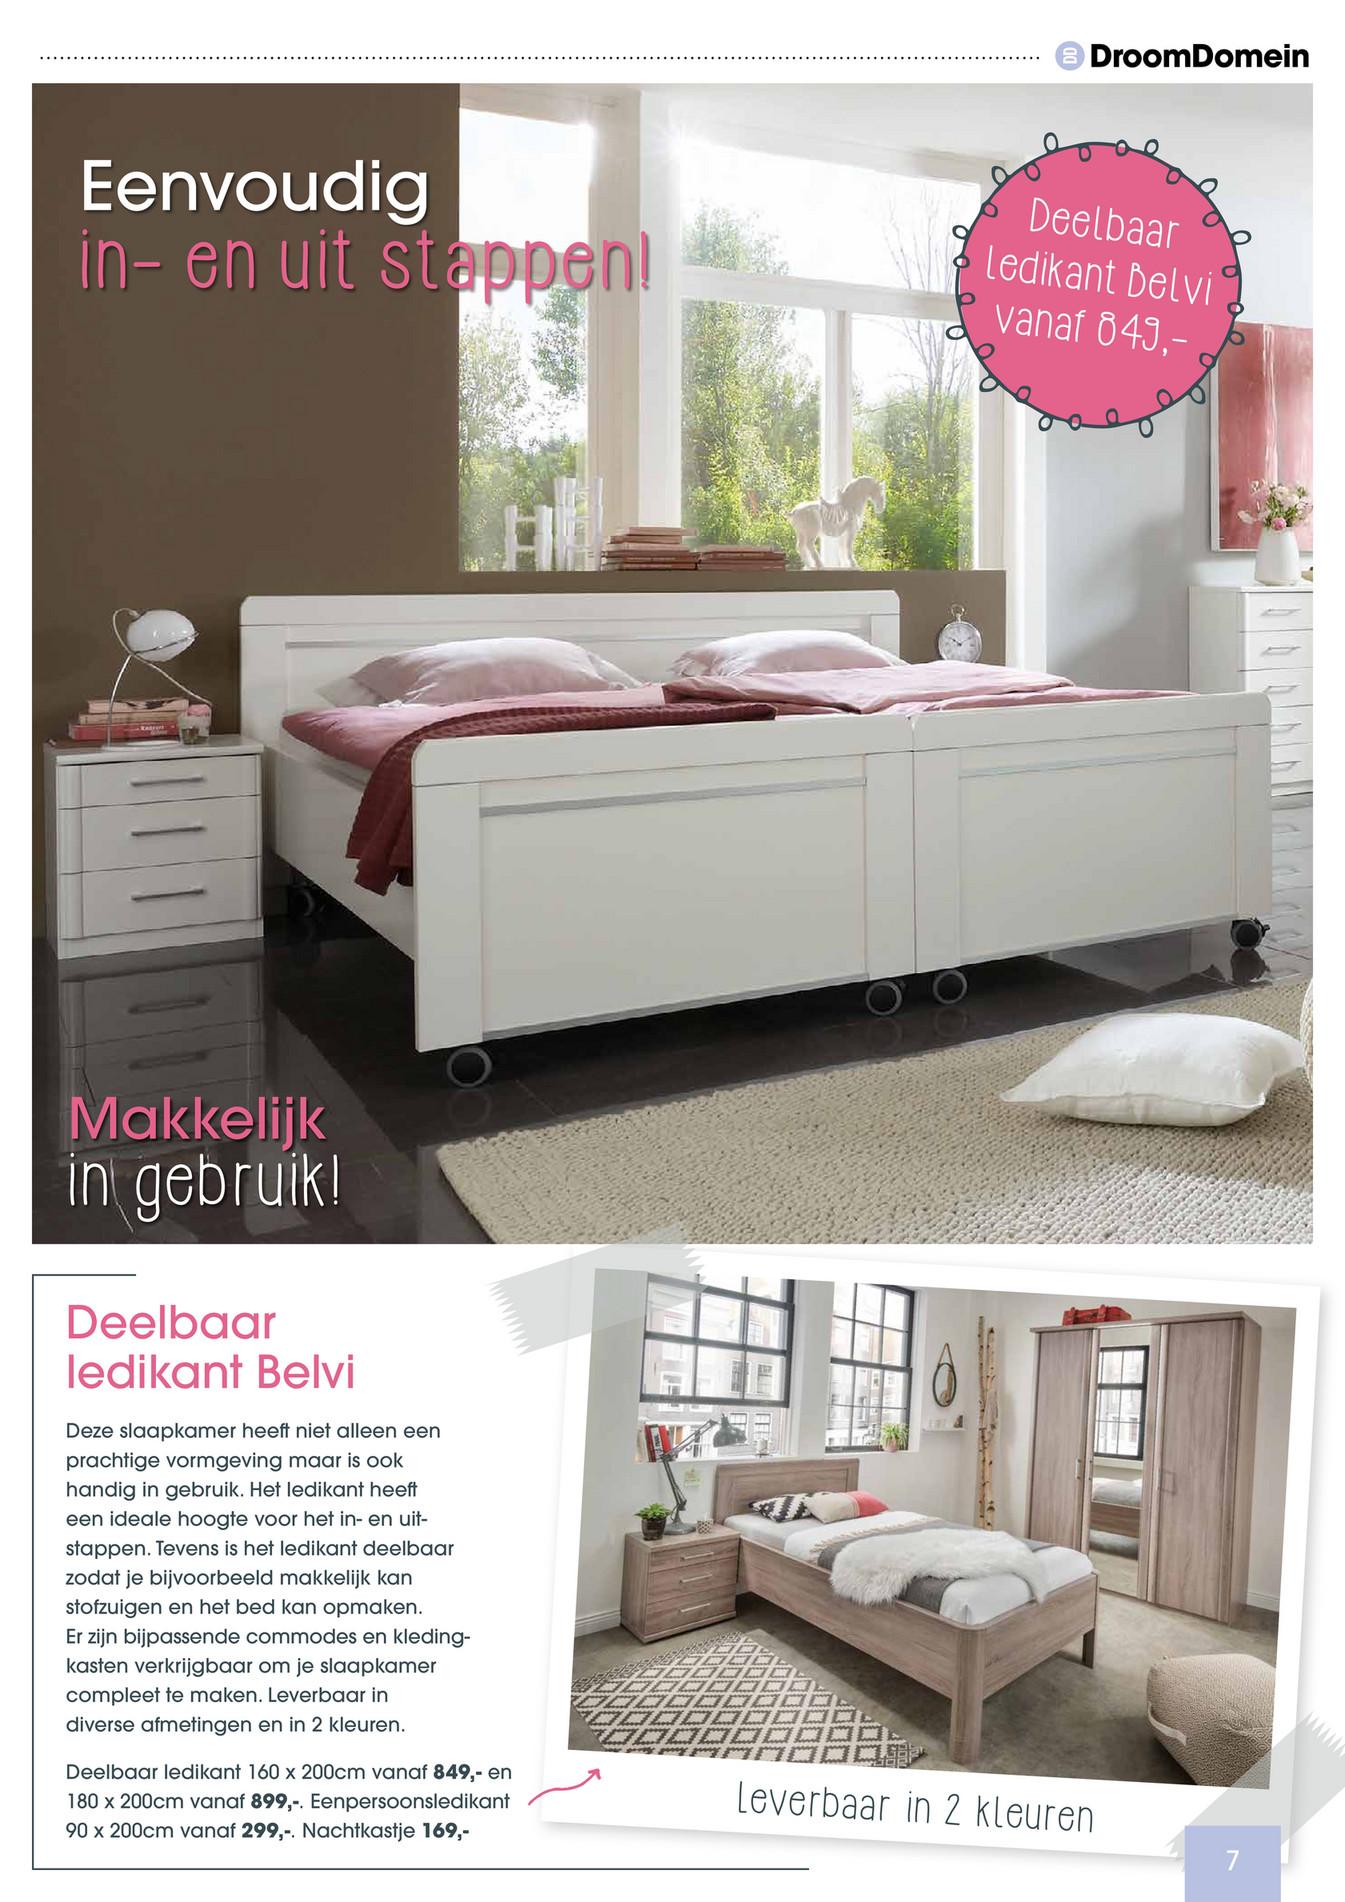 reclamefolder.nl - droomdomein-week21-17 - pagina 6-7, Deco ideeën